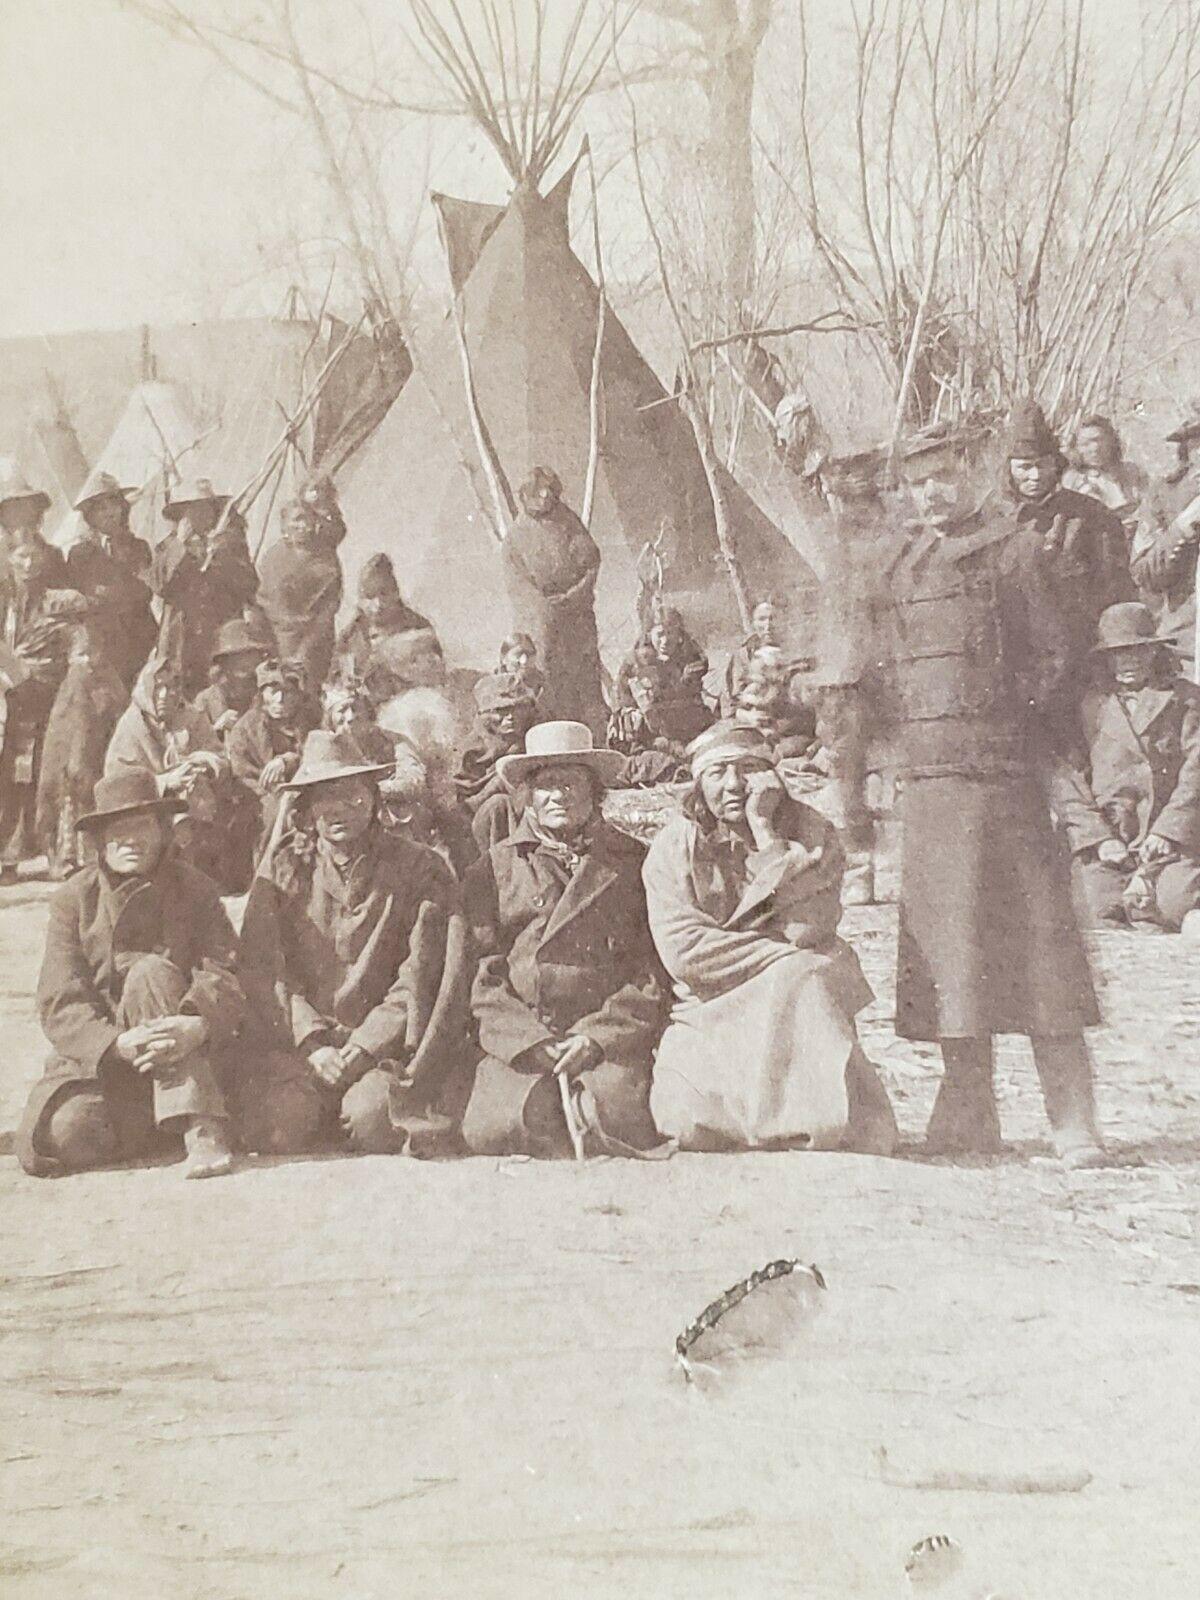 http://www.american-tribes.com/messageboards/dietmar/1891woundedknee3.jpg